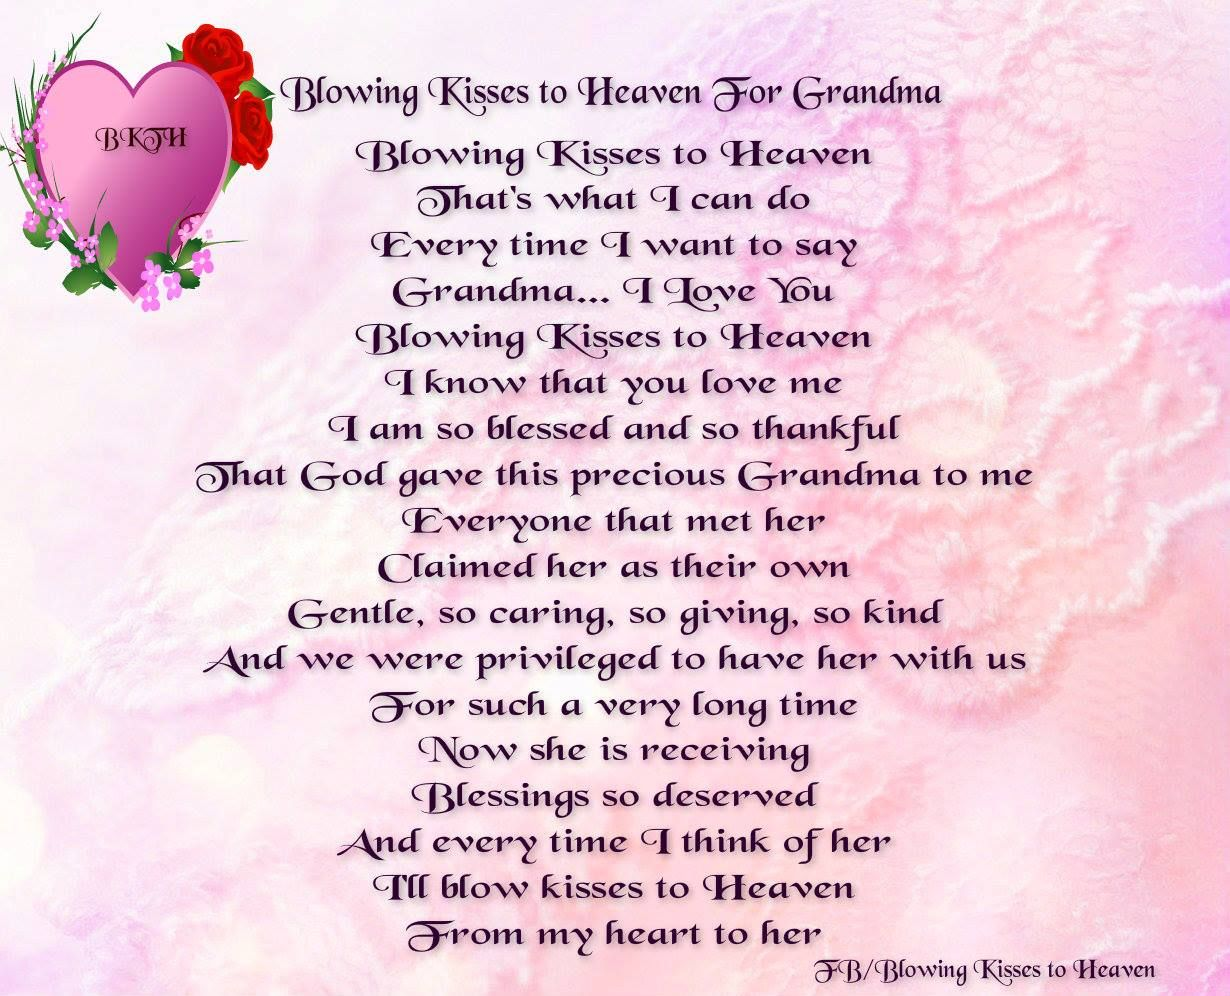 Valentines Day Quotes For Grandma: Grandma In Heaven Quotes. QuotesGram